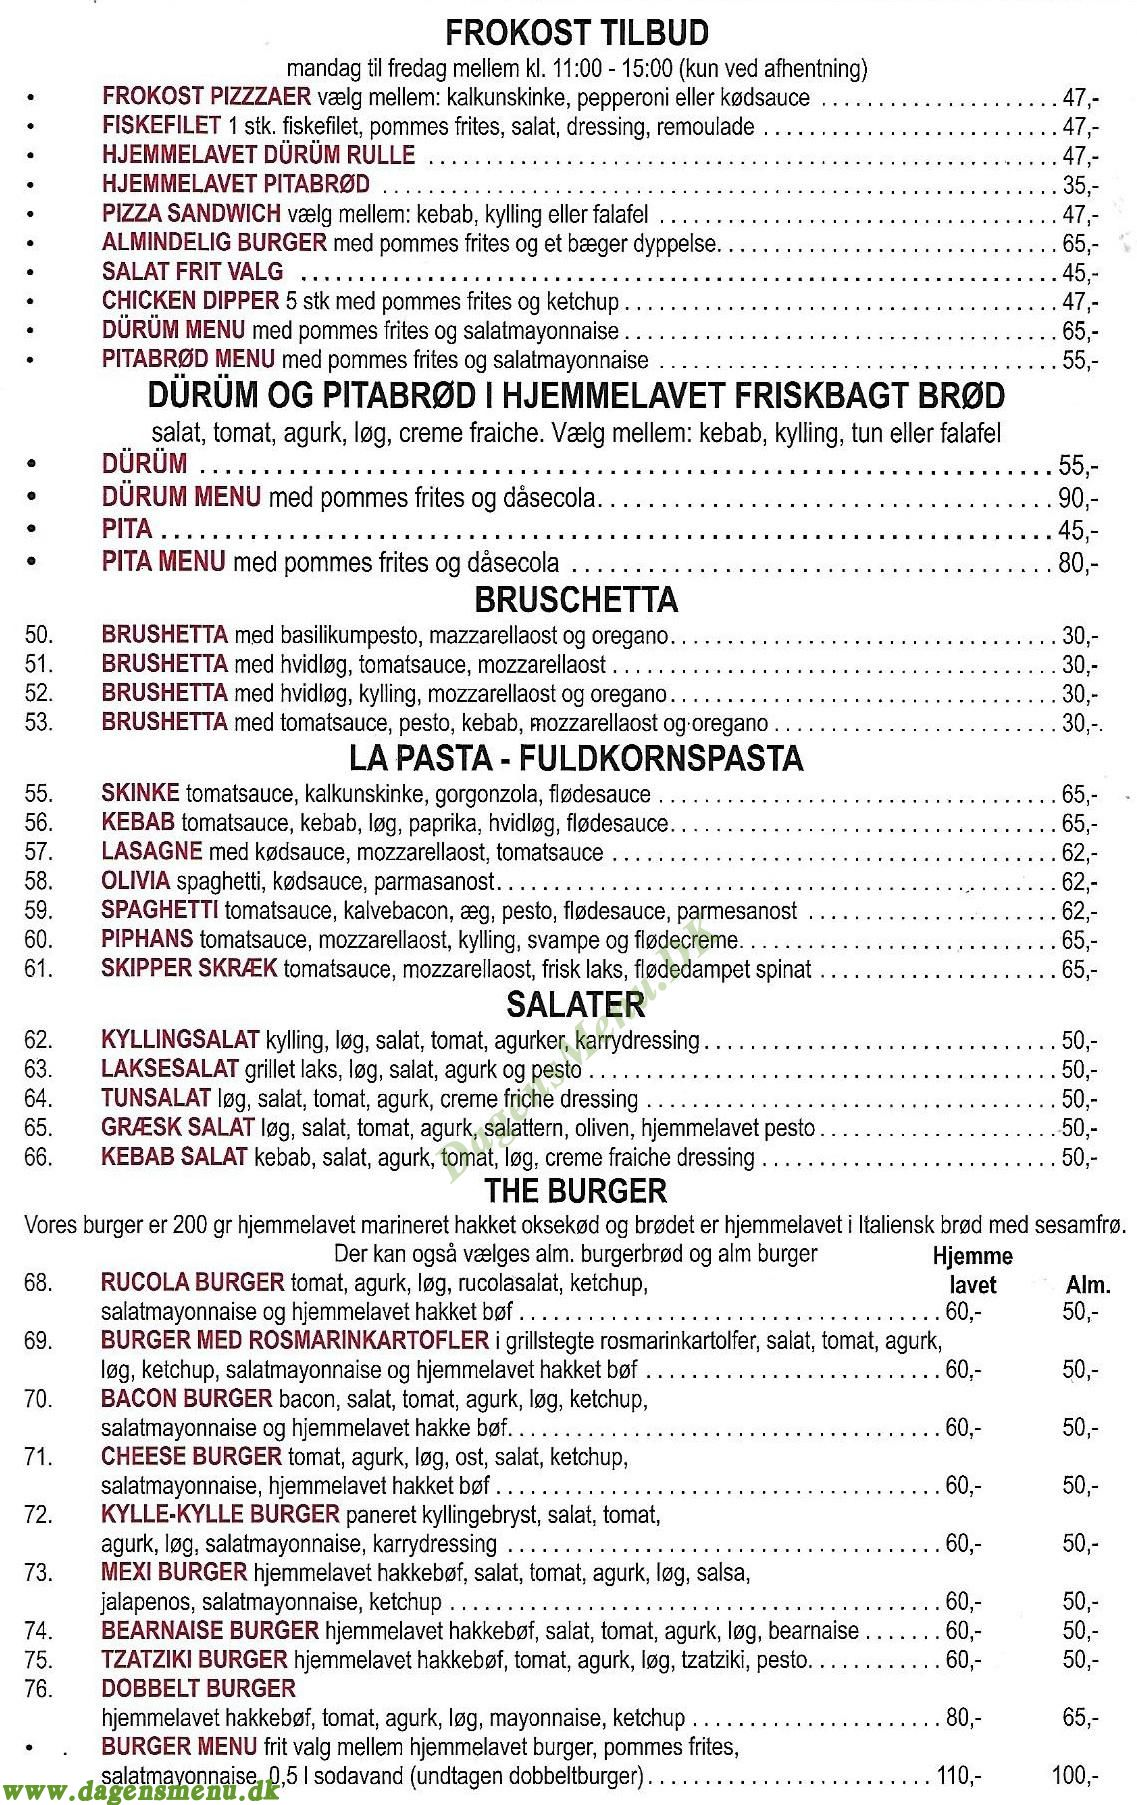 The Pizza & Sandwich - Menukort